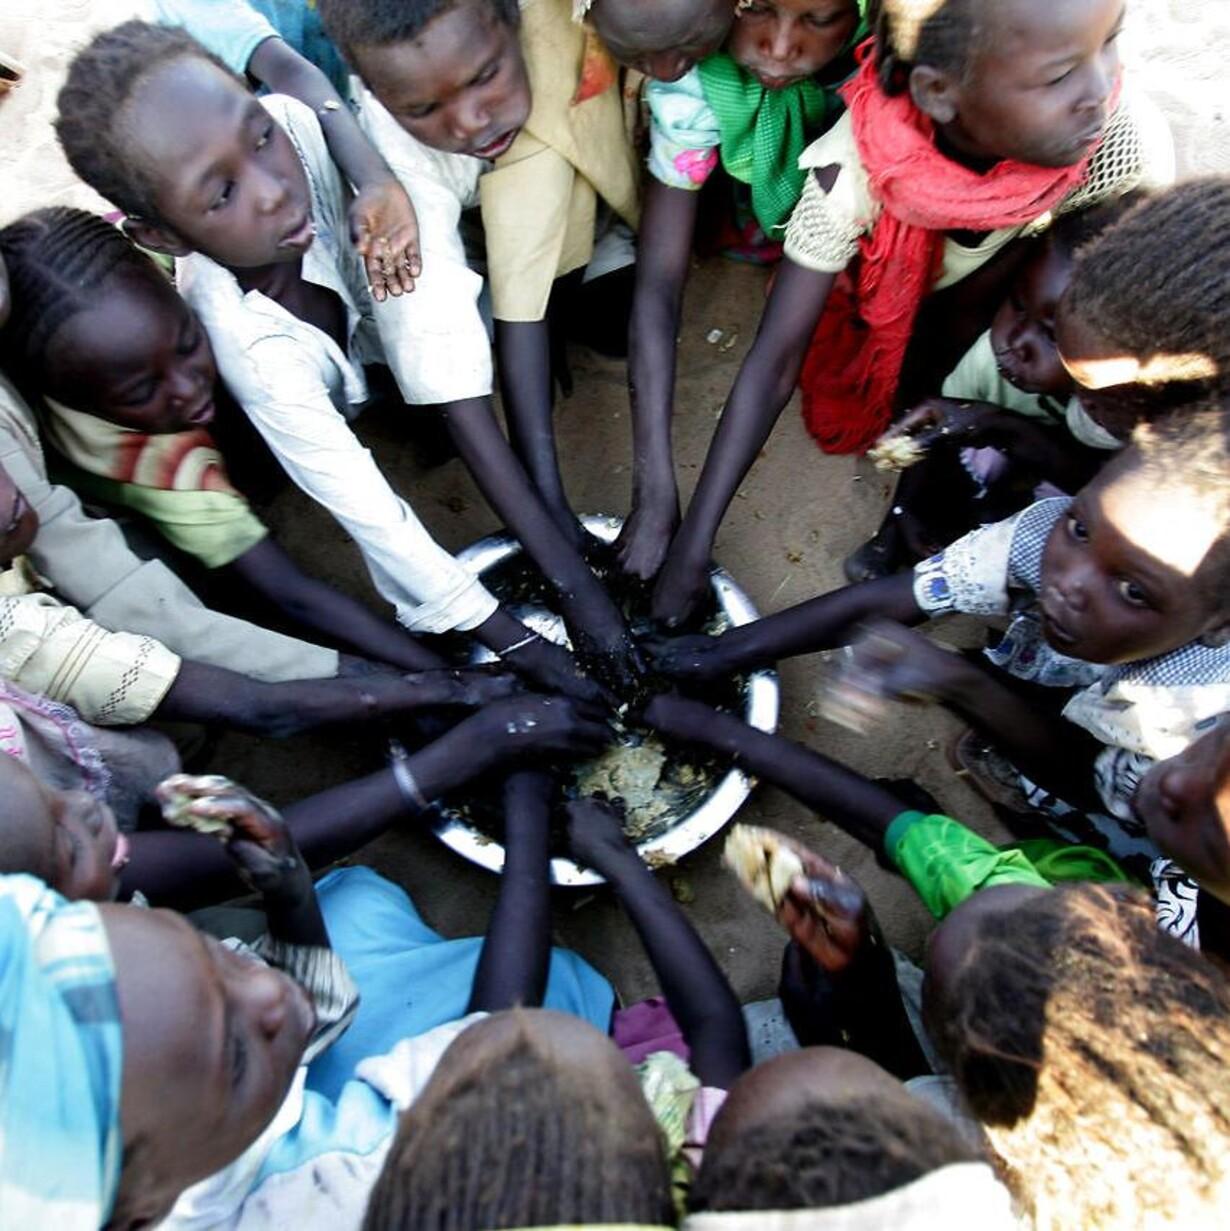 SUDAN-DARFUR-REFUGEES-WORLD-FOOD-DAY